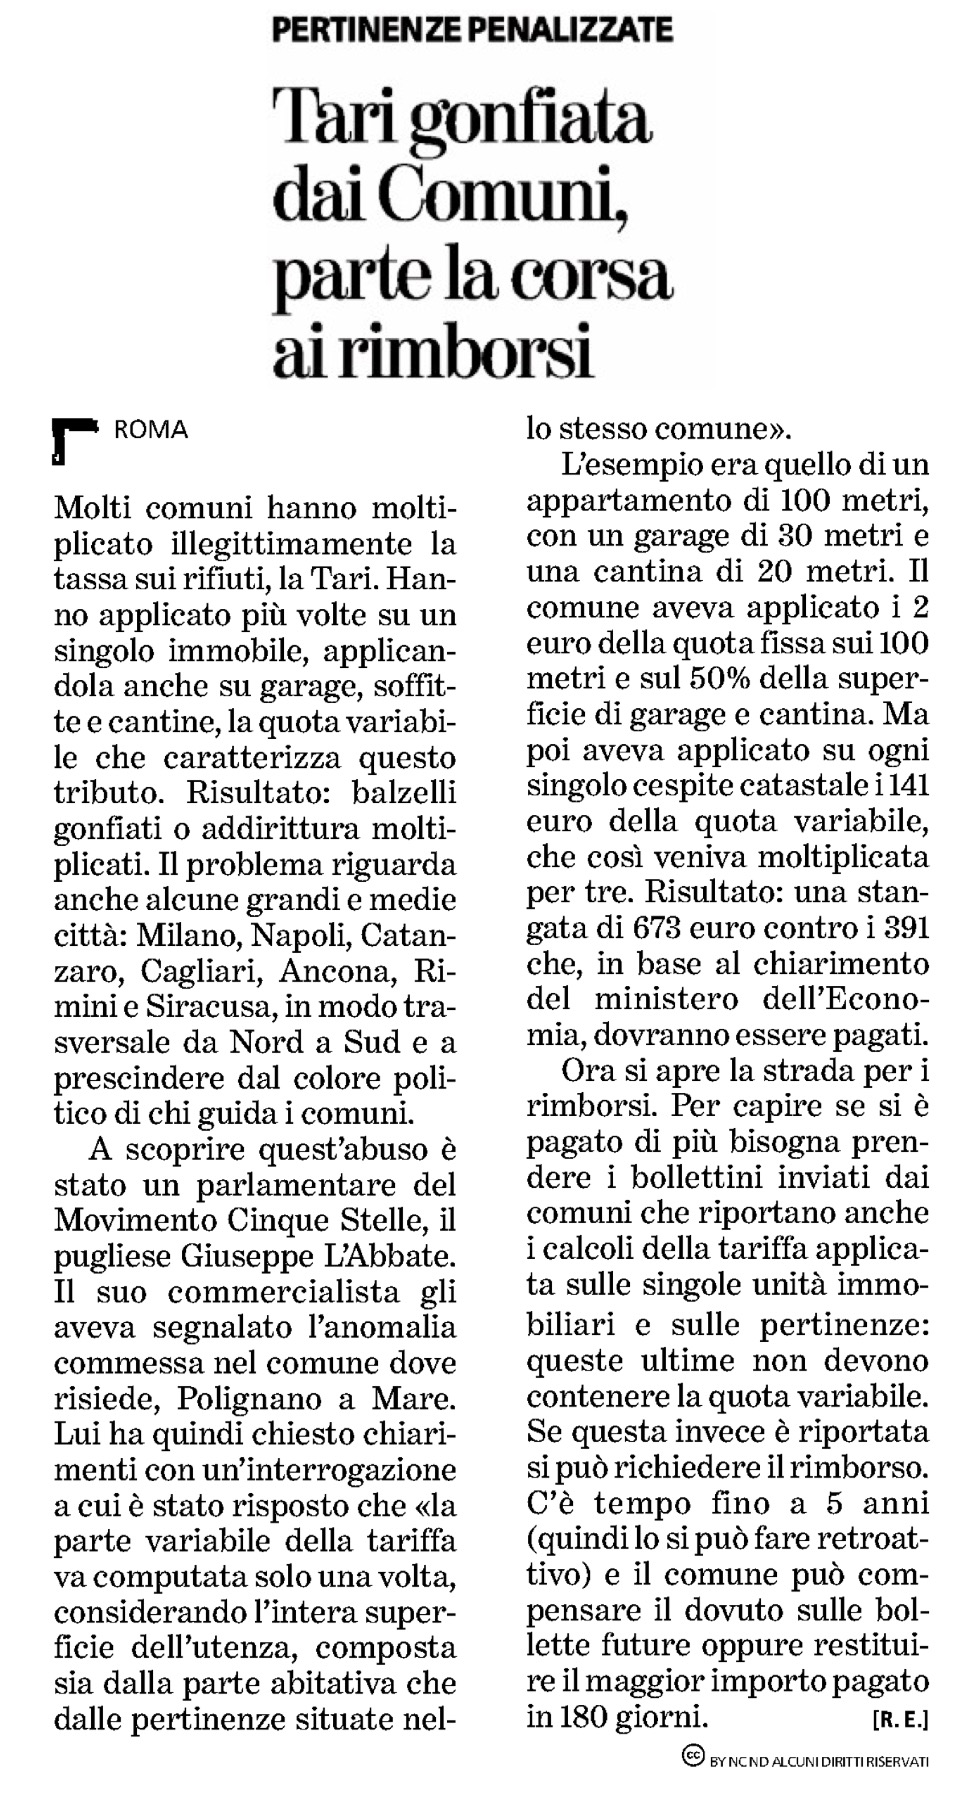 La Stampa - 11.11.2017